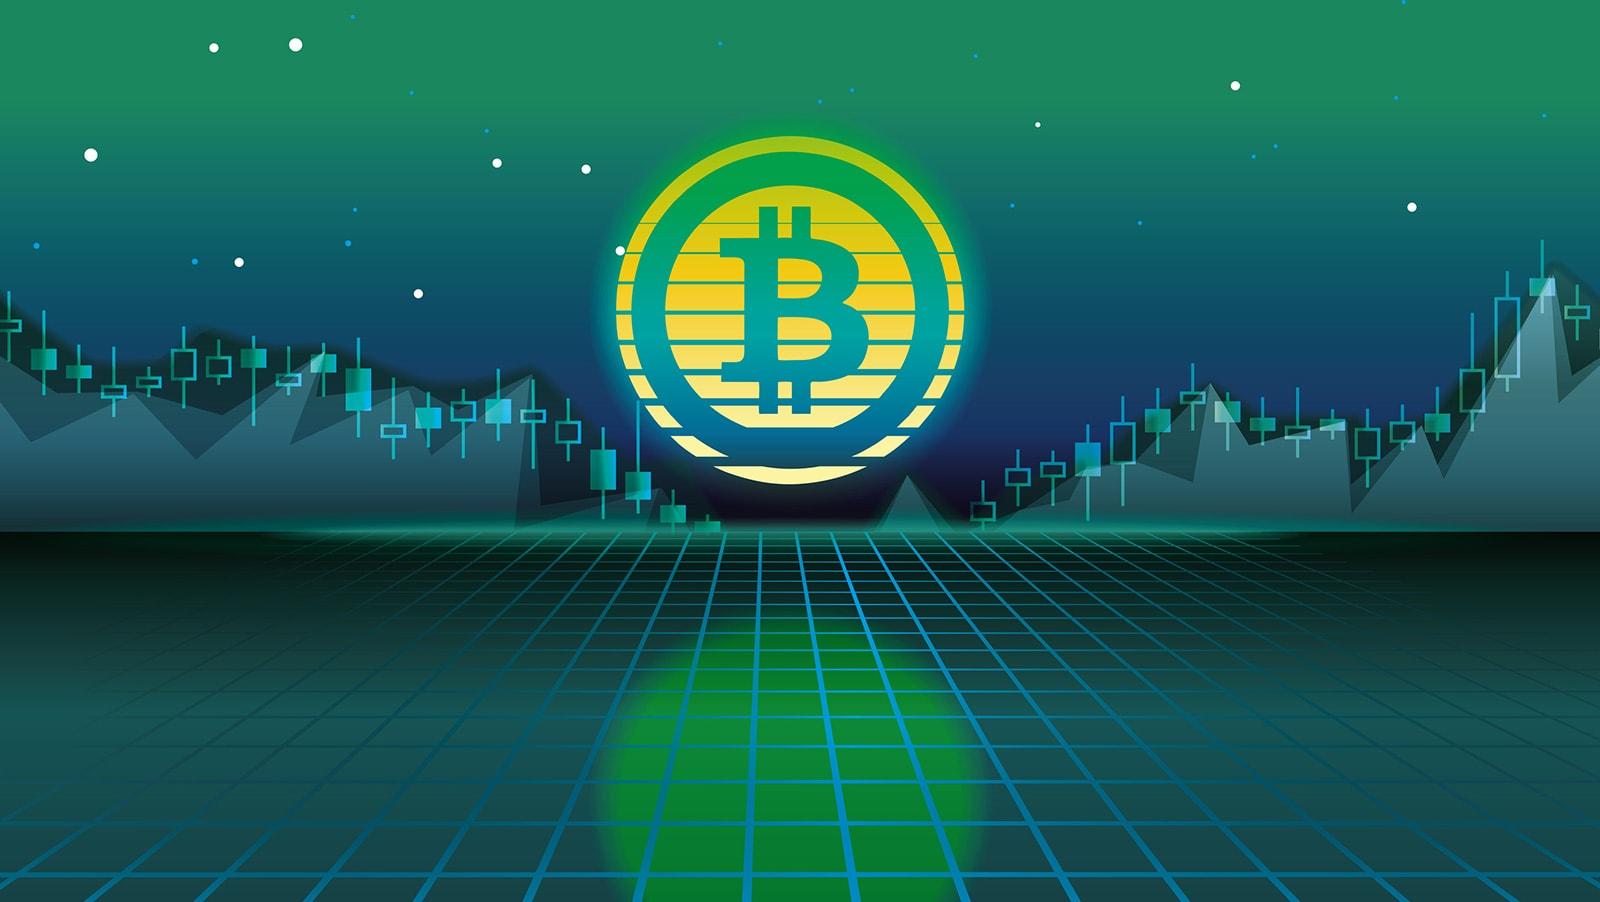 bitcoin meteorik altcoin yukselis tahmin jack sparrow